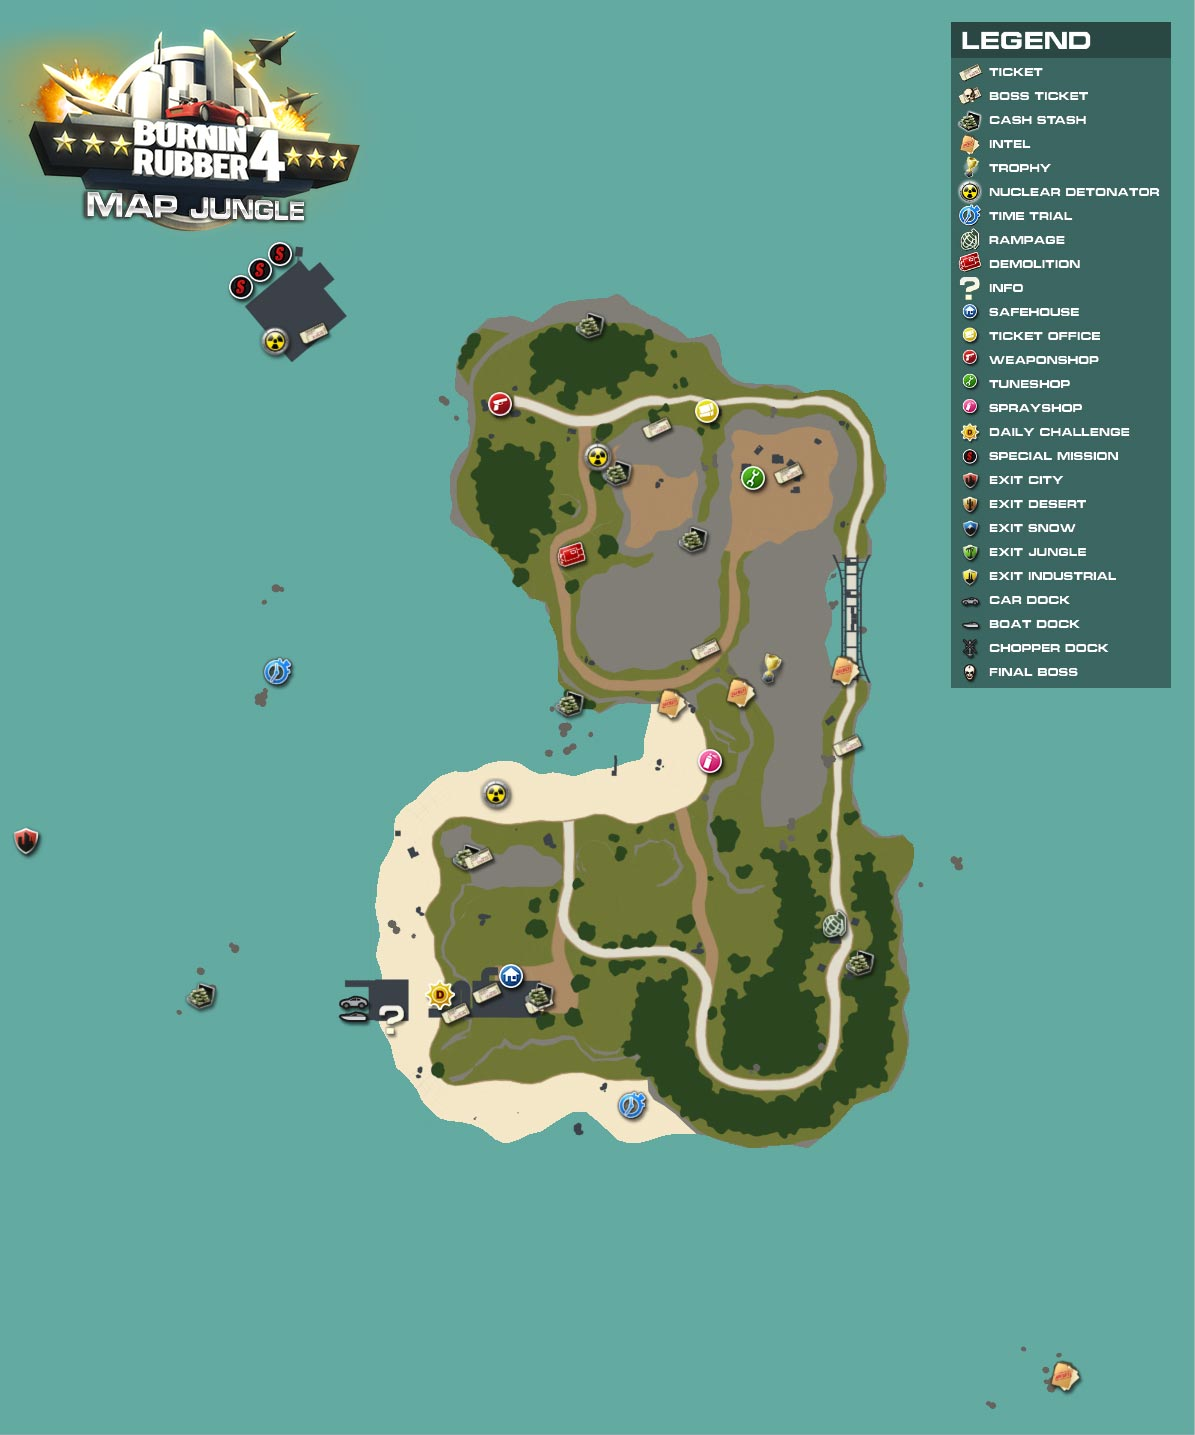 Xform game development burnin 39 rubber 5 contest for Floor 4 mini boss map